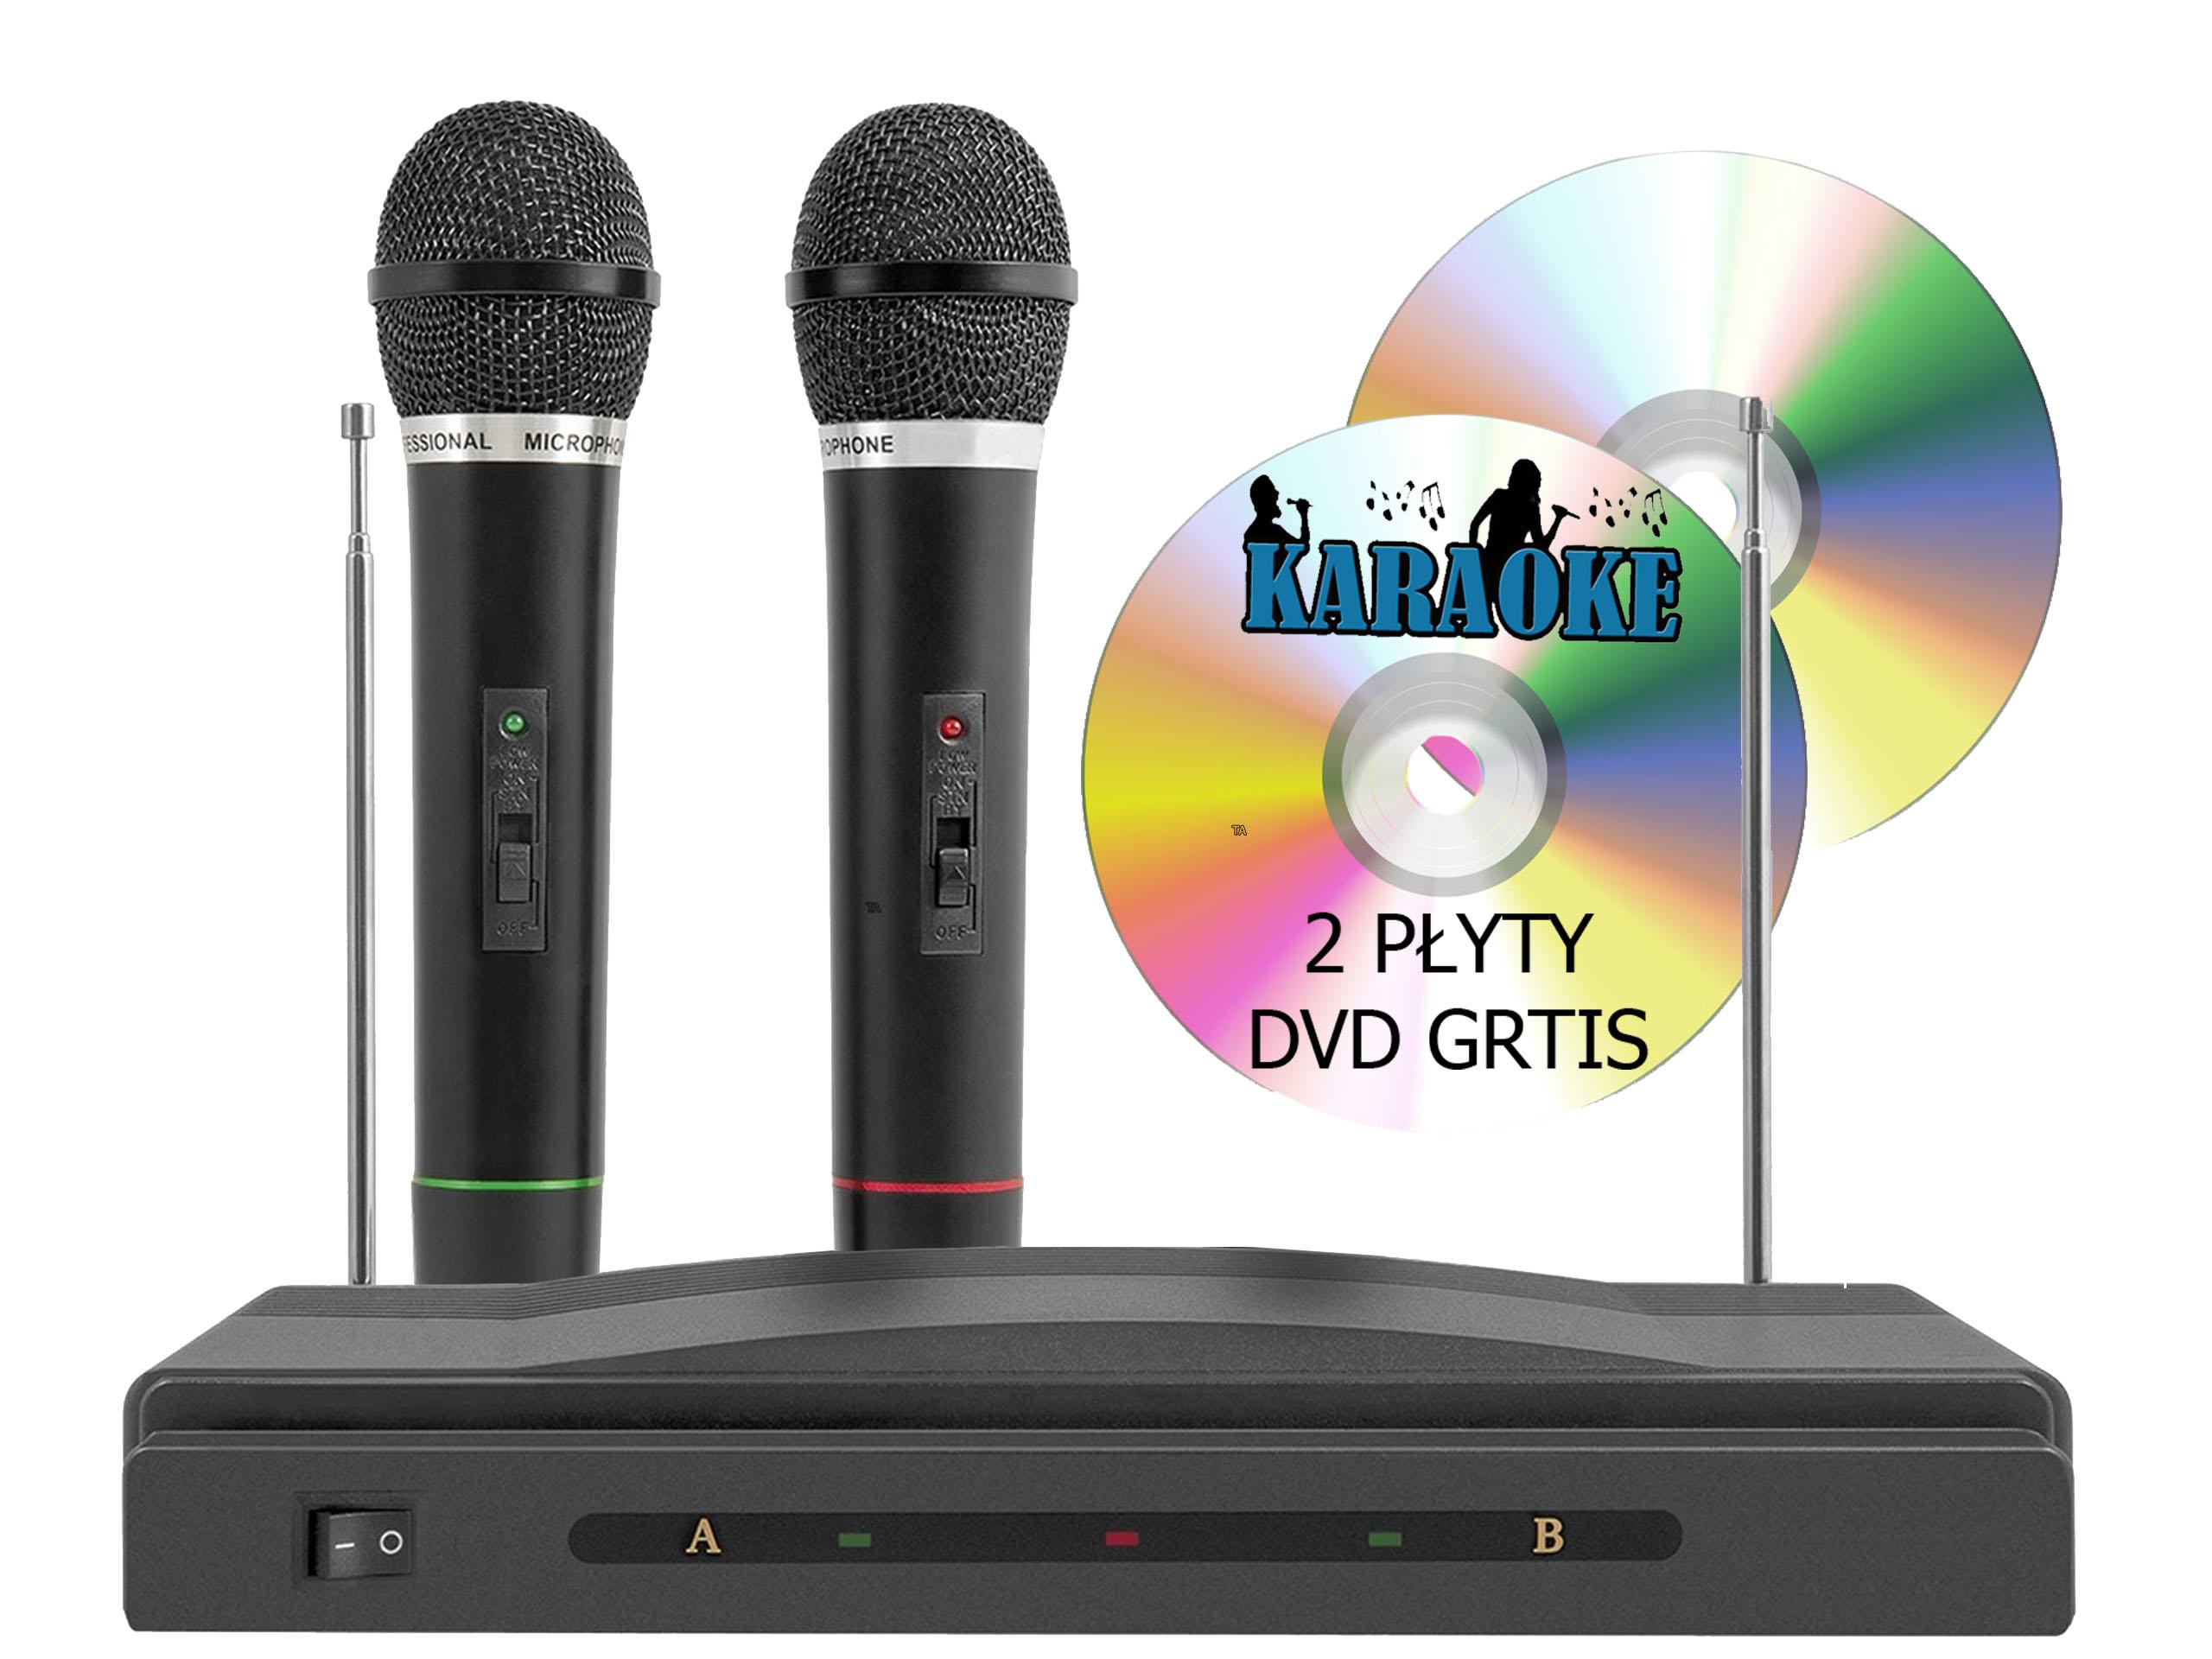 5V1 Karaoke Set = stanica + 2x mikrofón + 2x DVD